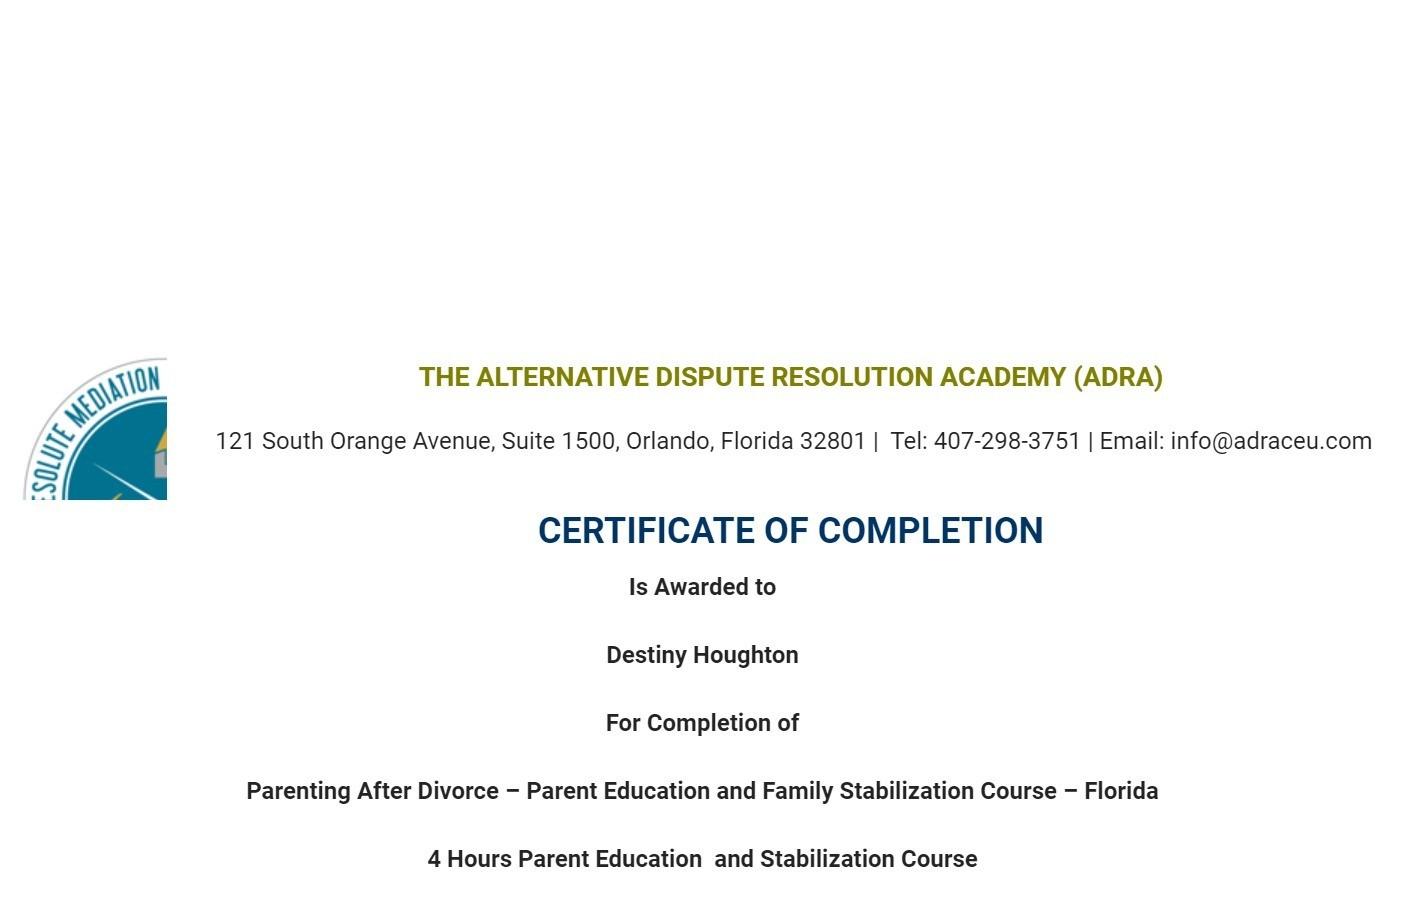 Certificate for User Destiny Houghton